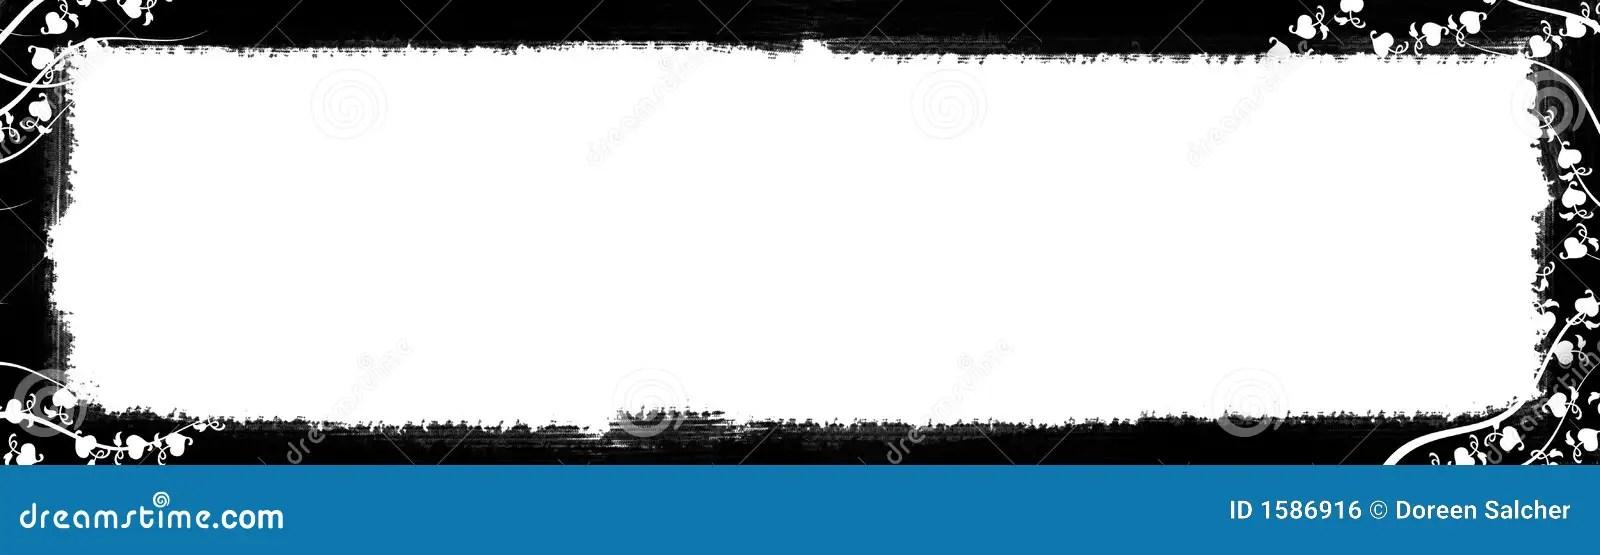 Black And White Text Border Stock Illustration - Illustration of